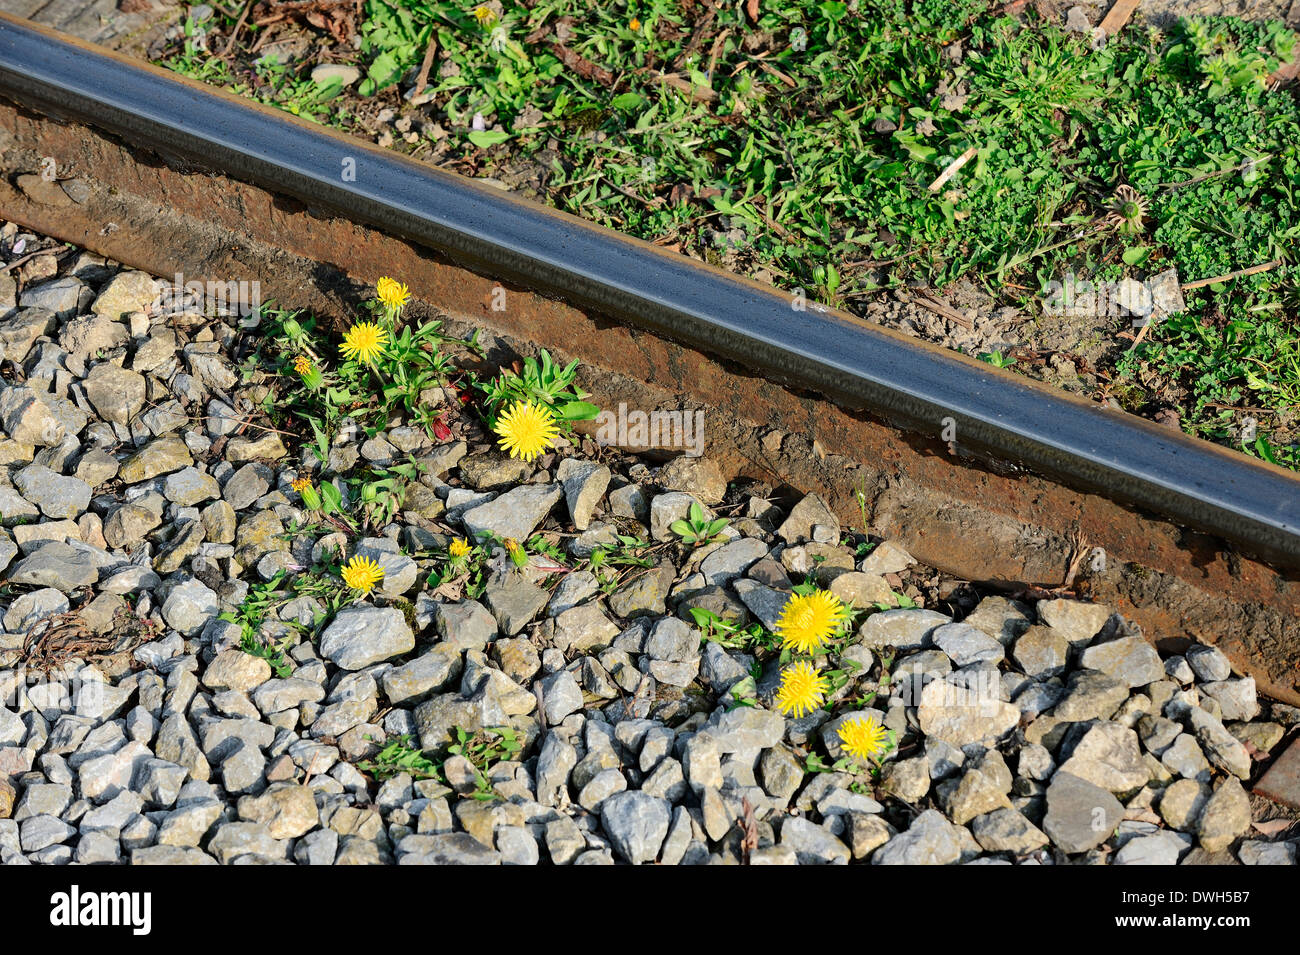 Dandelion (Taraxacum officinale) and railroad track, North Rhine-Westphalia, Germany - Stock Image